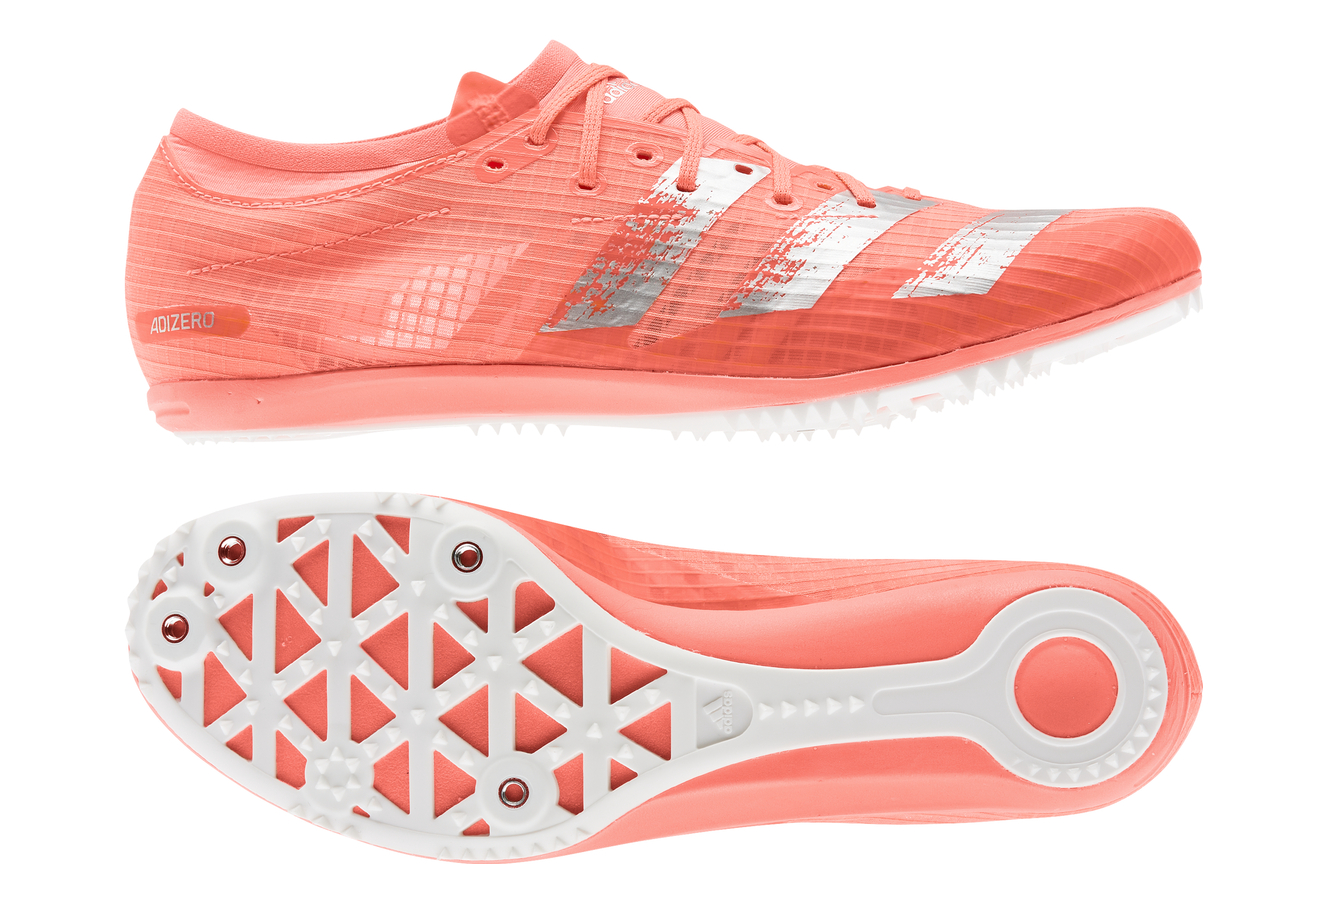 Chaussures d'Athlétisme adidas running adizero Ambition